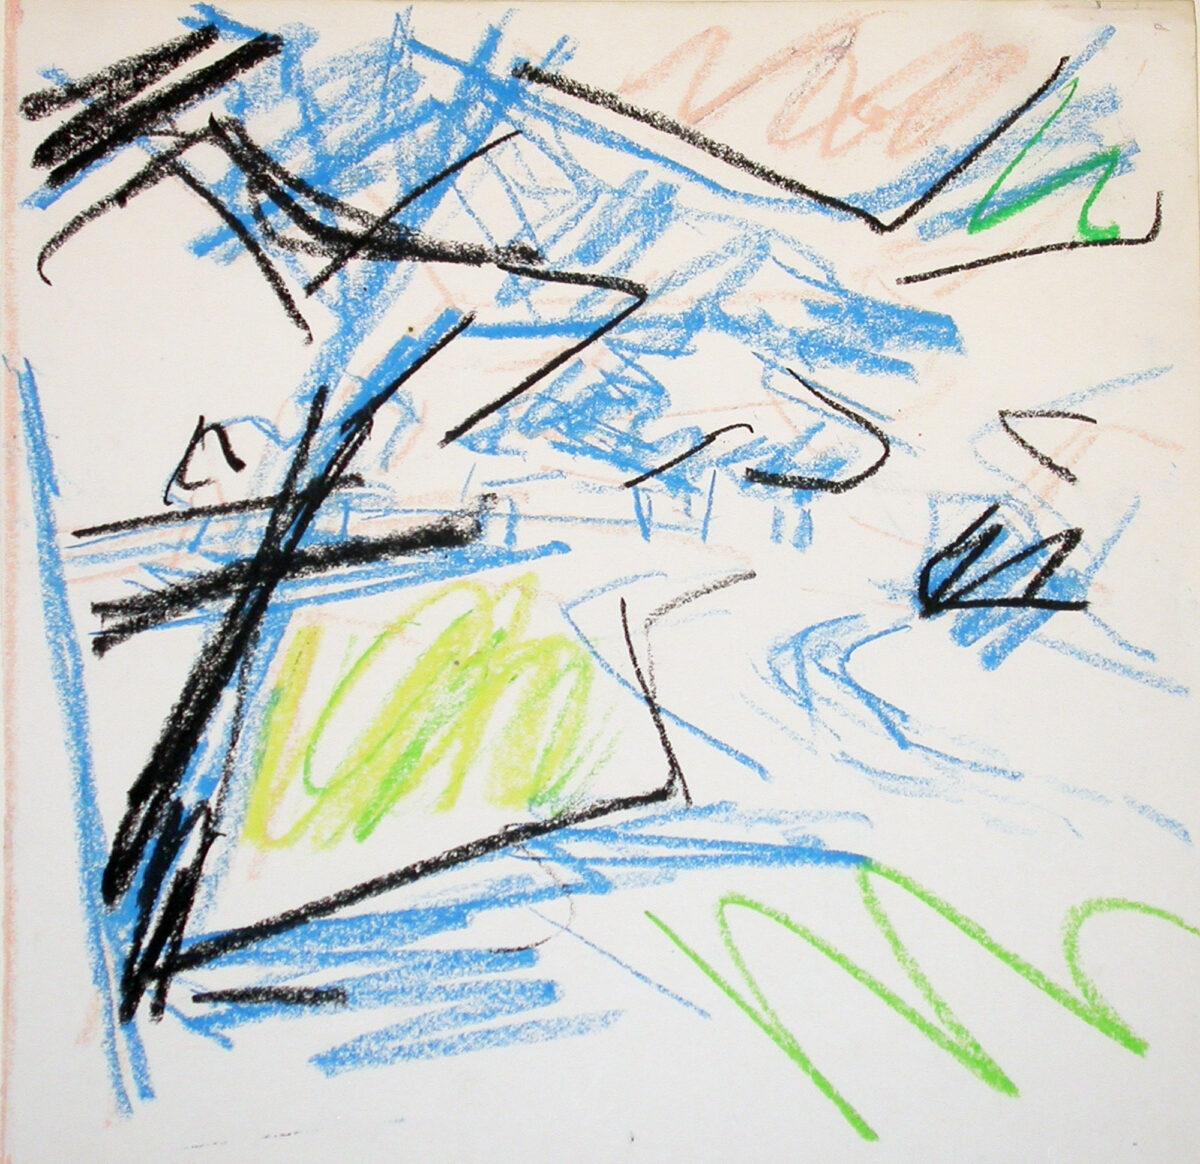 Frank Auerbach Primrose Hill oil bar on paper for sale